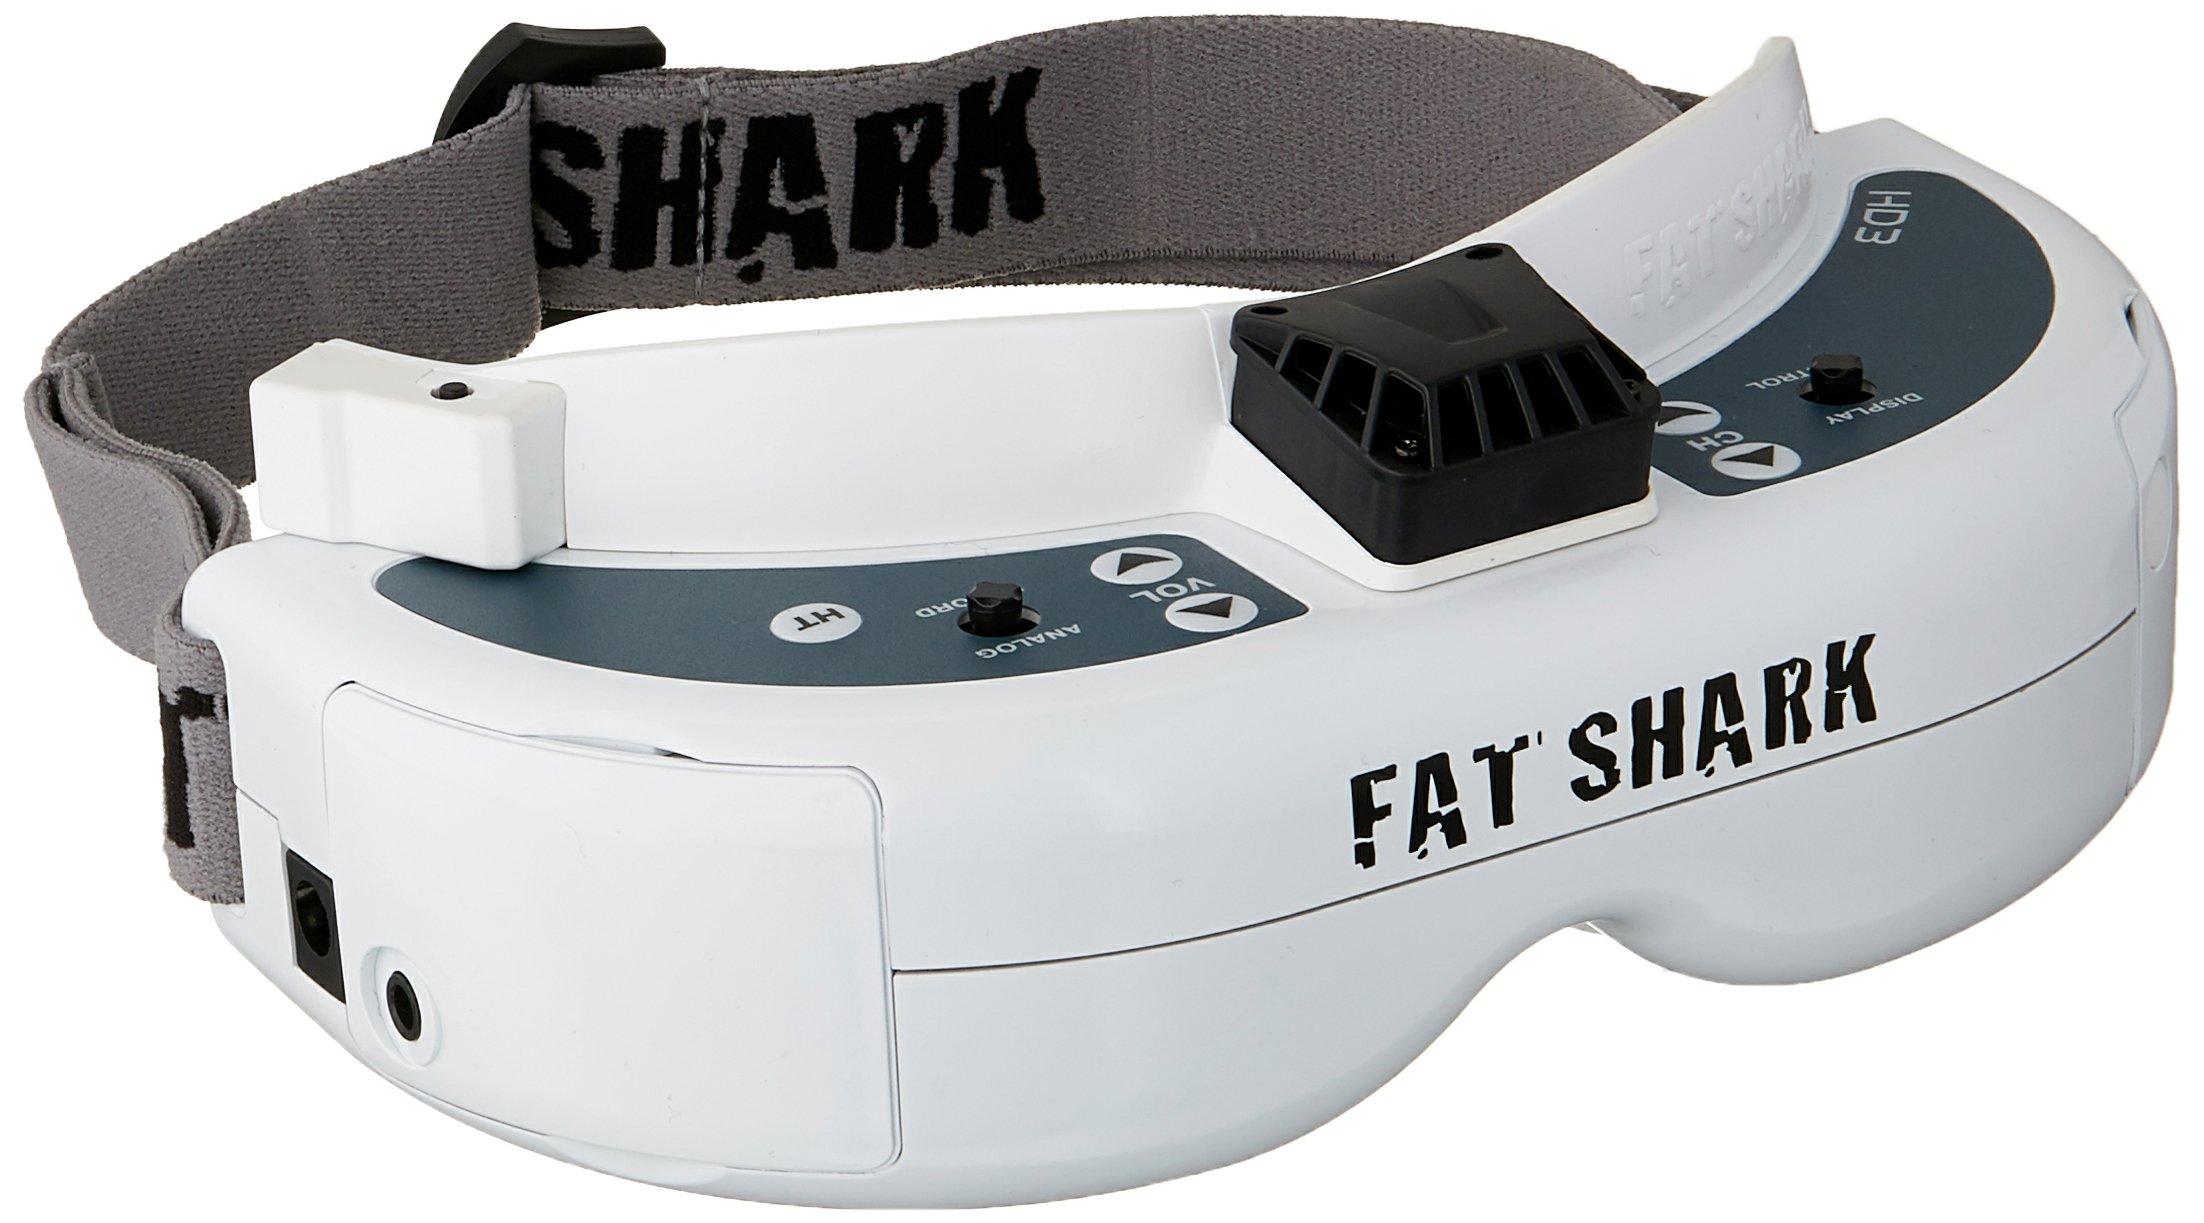 Fat Shark FSV1076 Dominator HD3 Toy Hobby Rc Vehicle Accessories